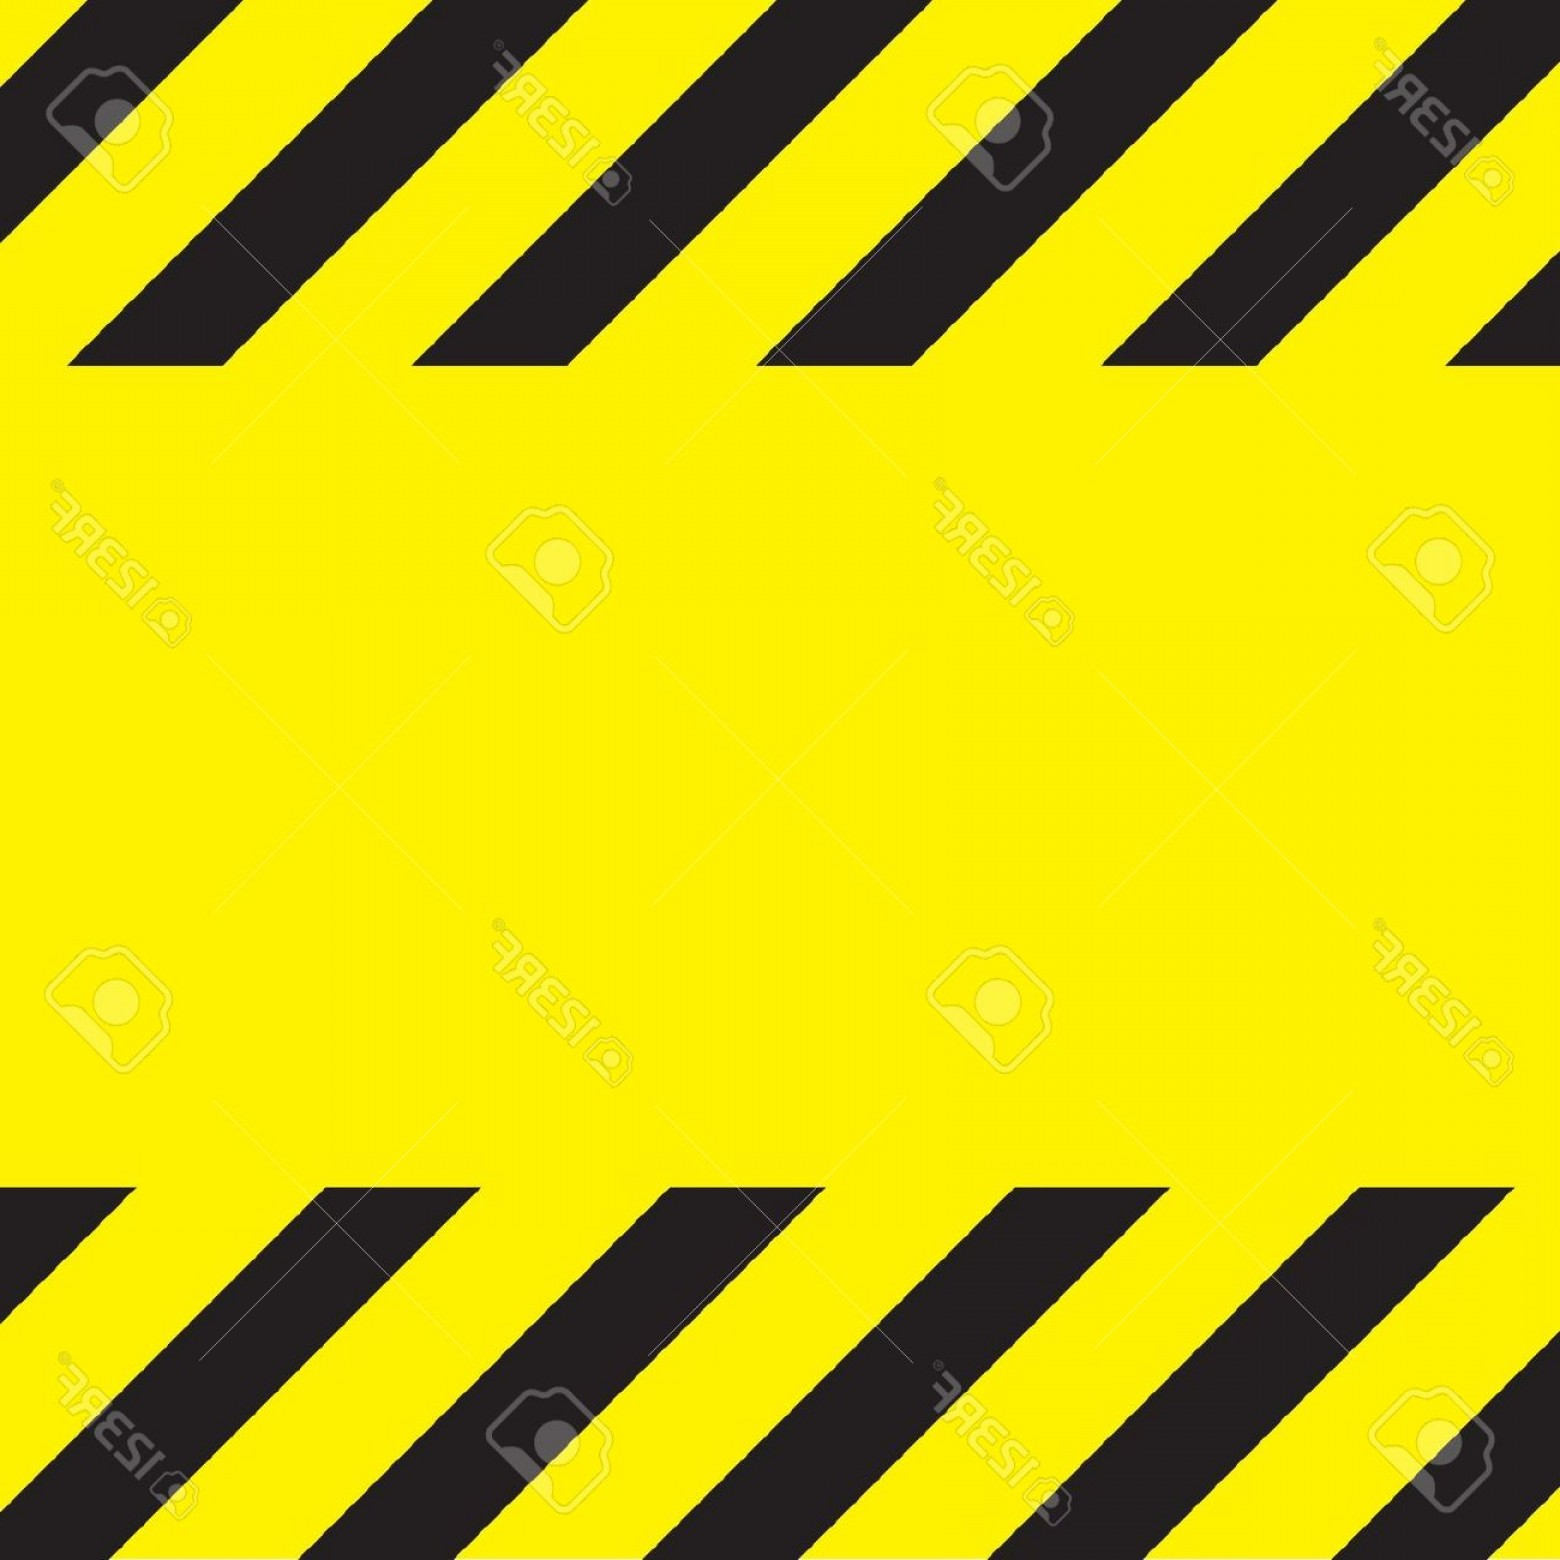 Caution clipart background. Photosimple construction stripes on